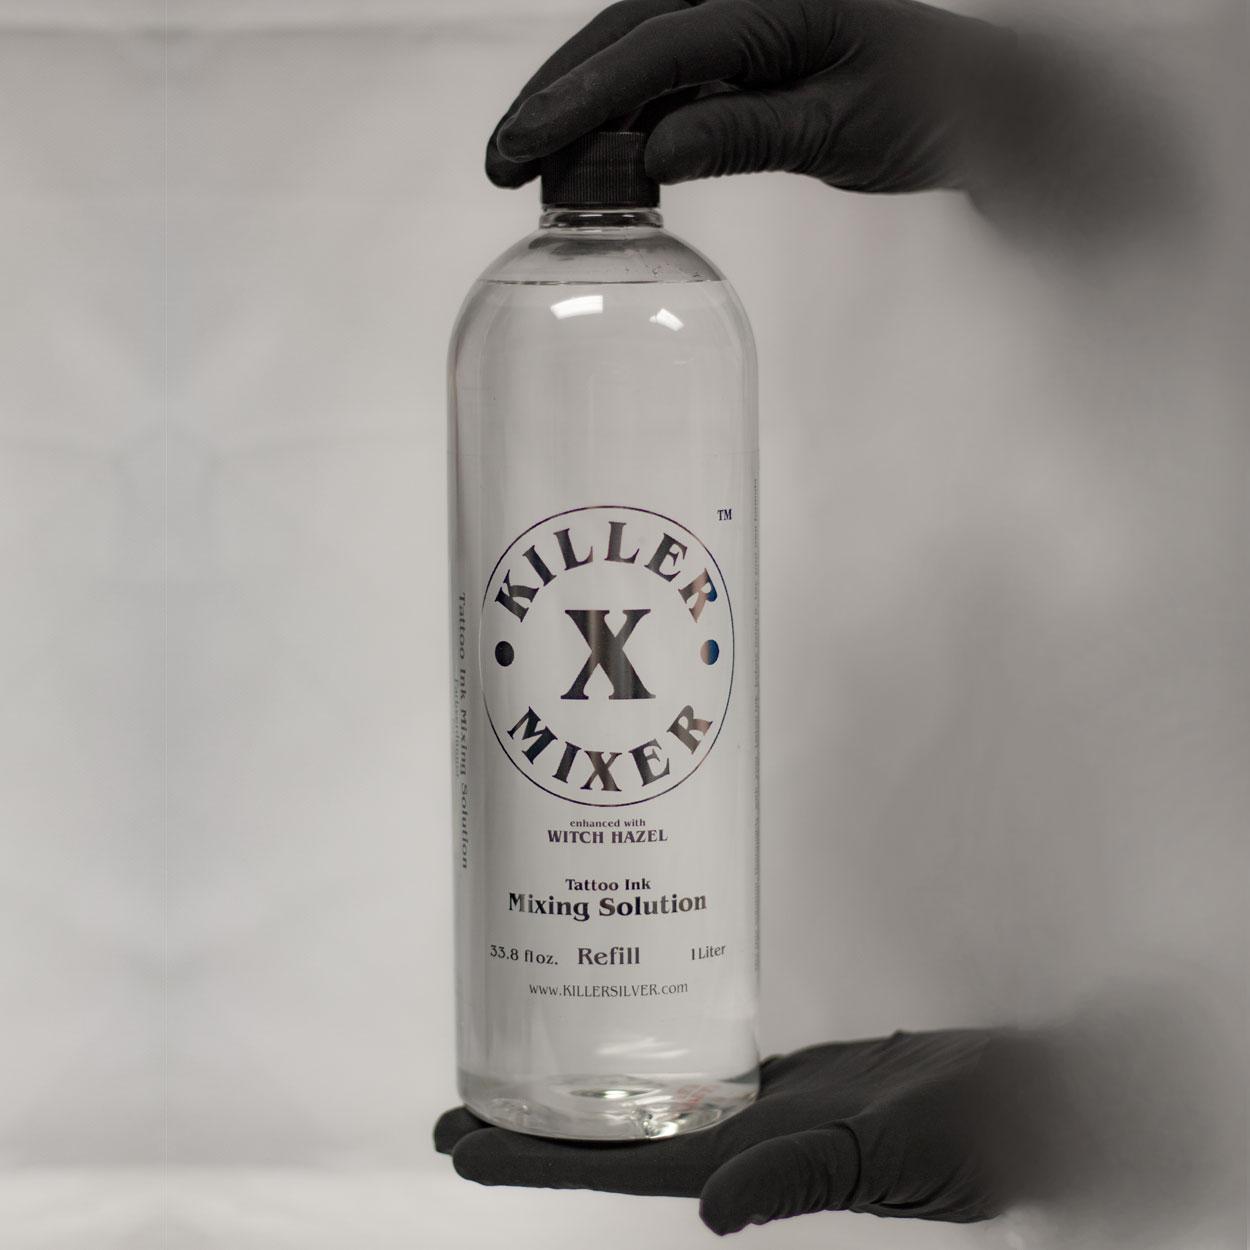 Tattoo Ink Mixing Solution - Killer X Mixer - Killer Silver